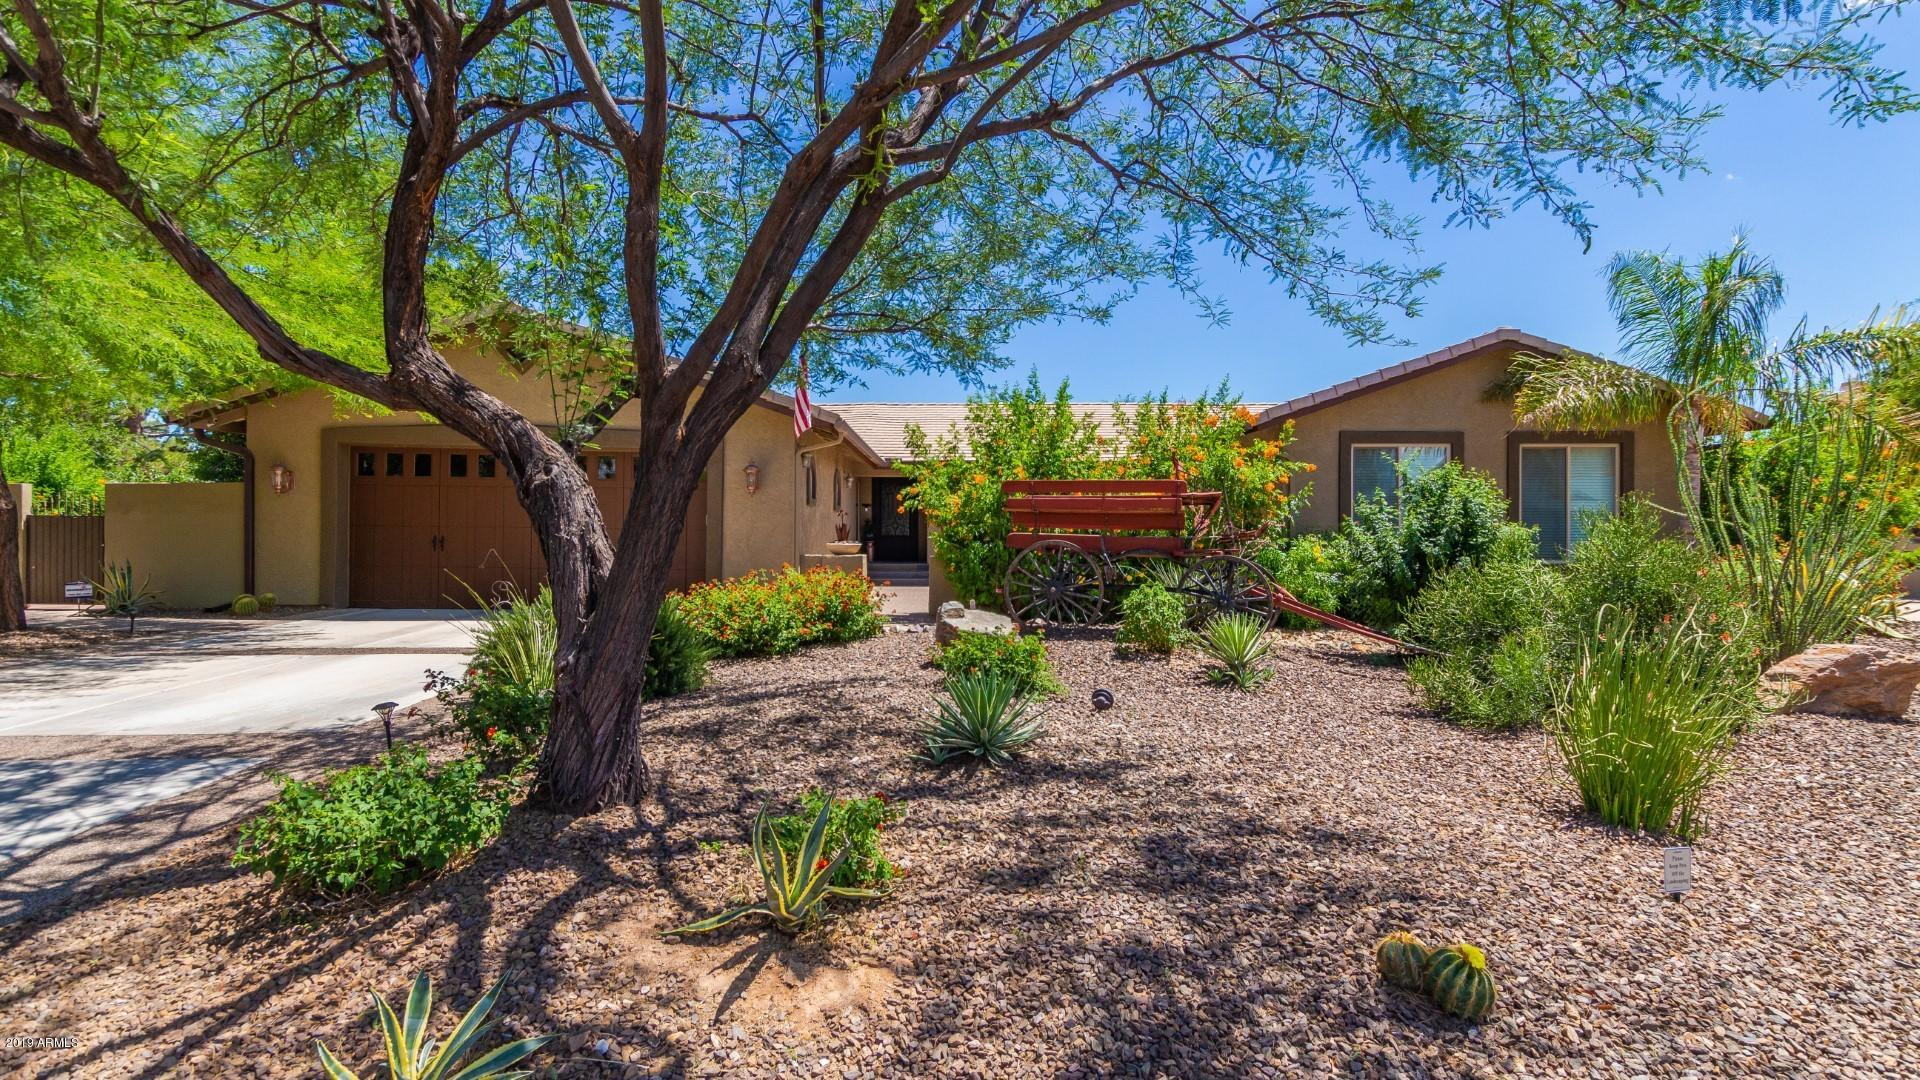 5223 W SOFT WIND Drive, Deer Valley, Arizona